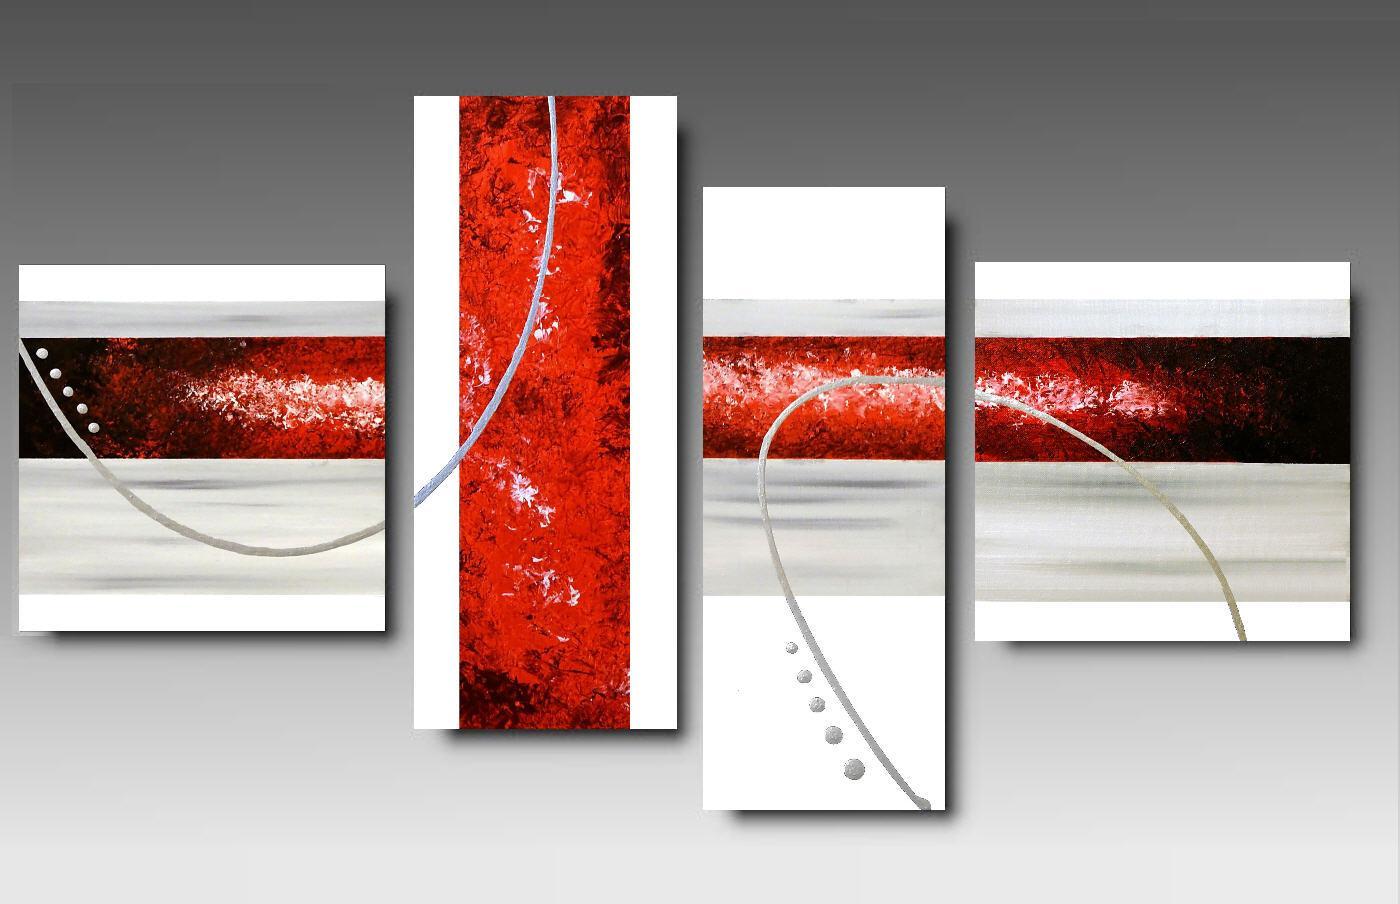 Lampadario vetro moderno led 4000k for Dipinti a mano su tela